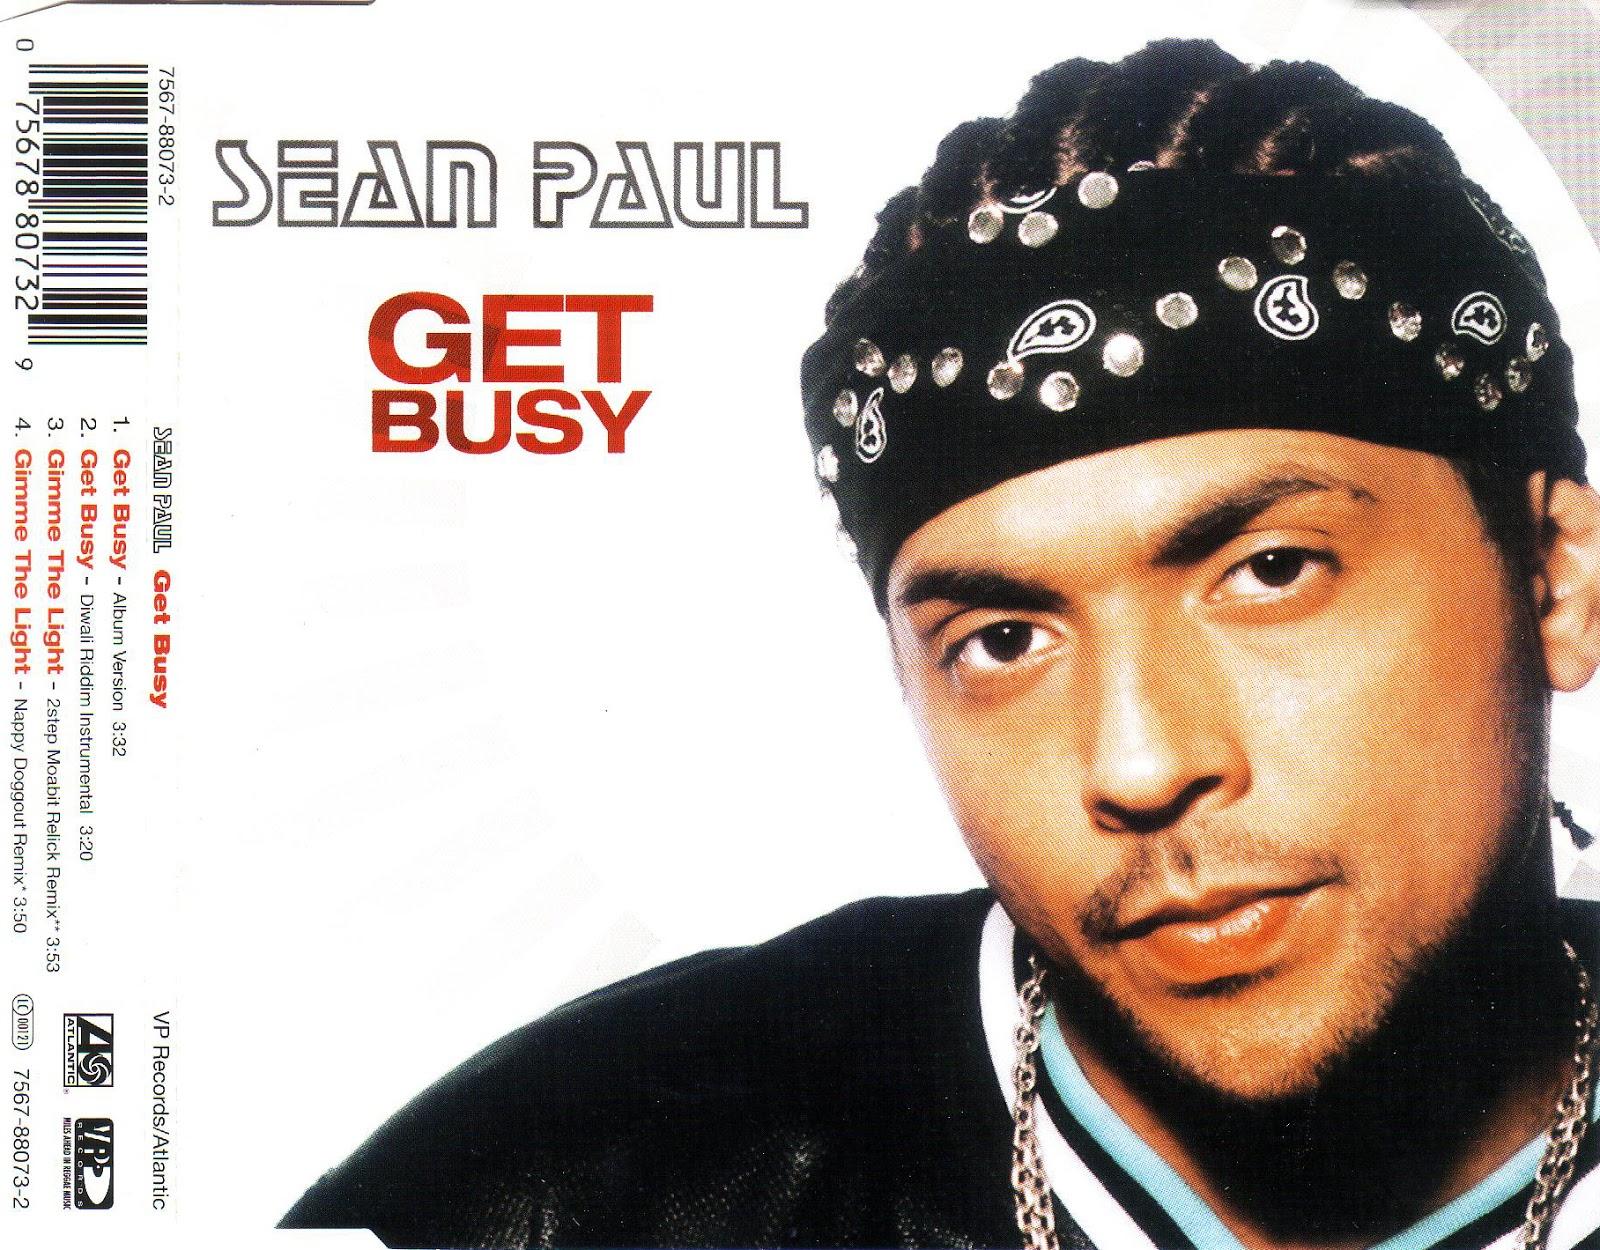 drony_dj Electro Bass: Sean Paul - Get Busy (CD, Maxi-Single